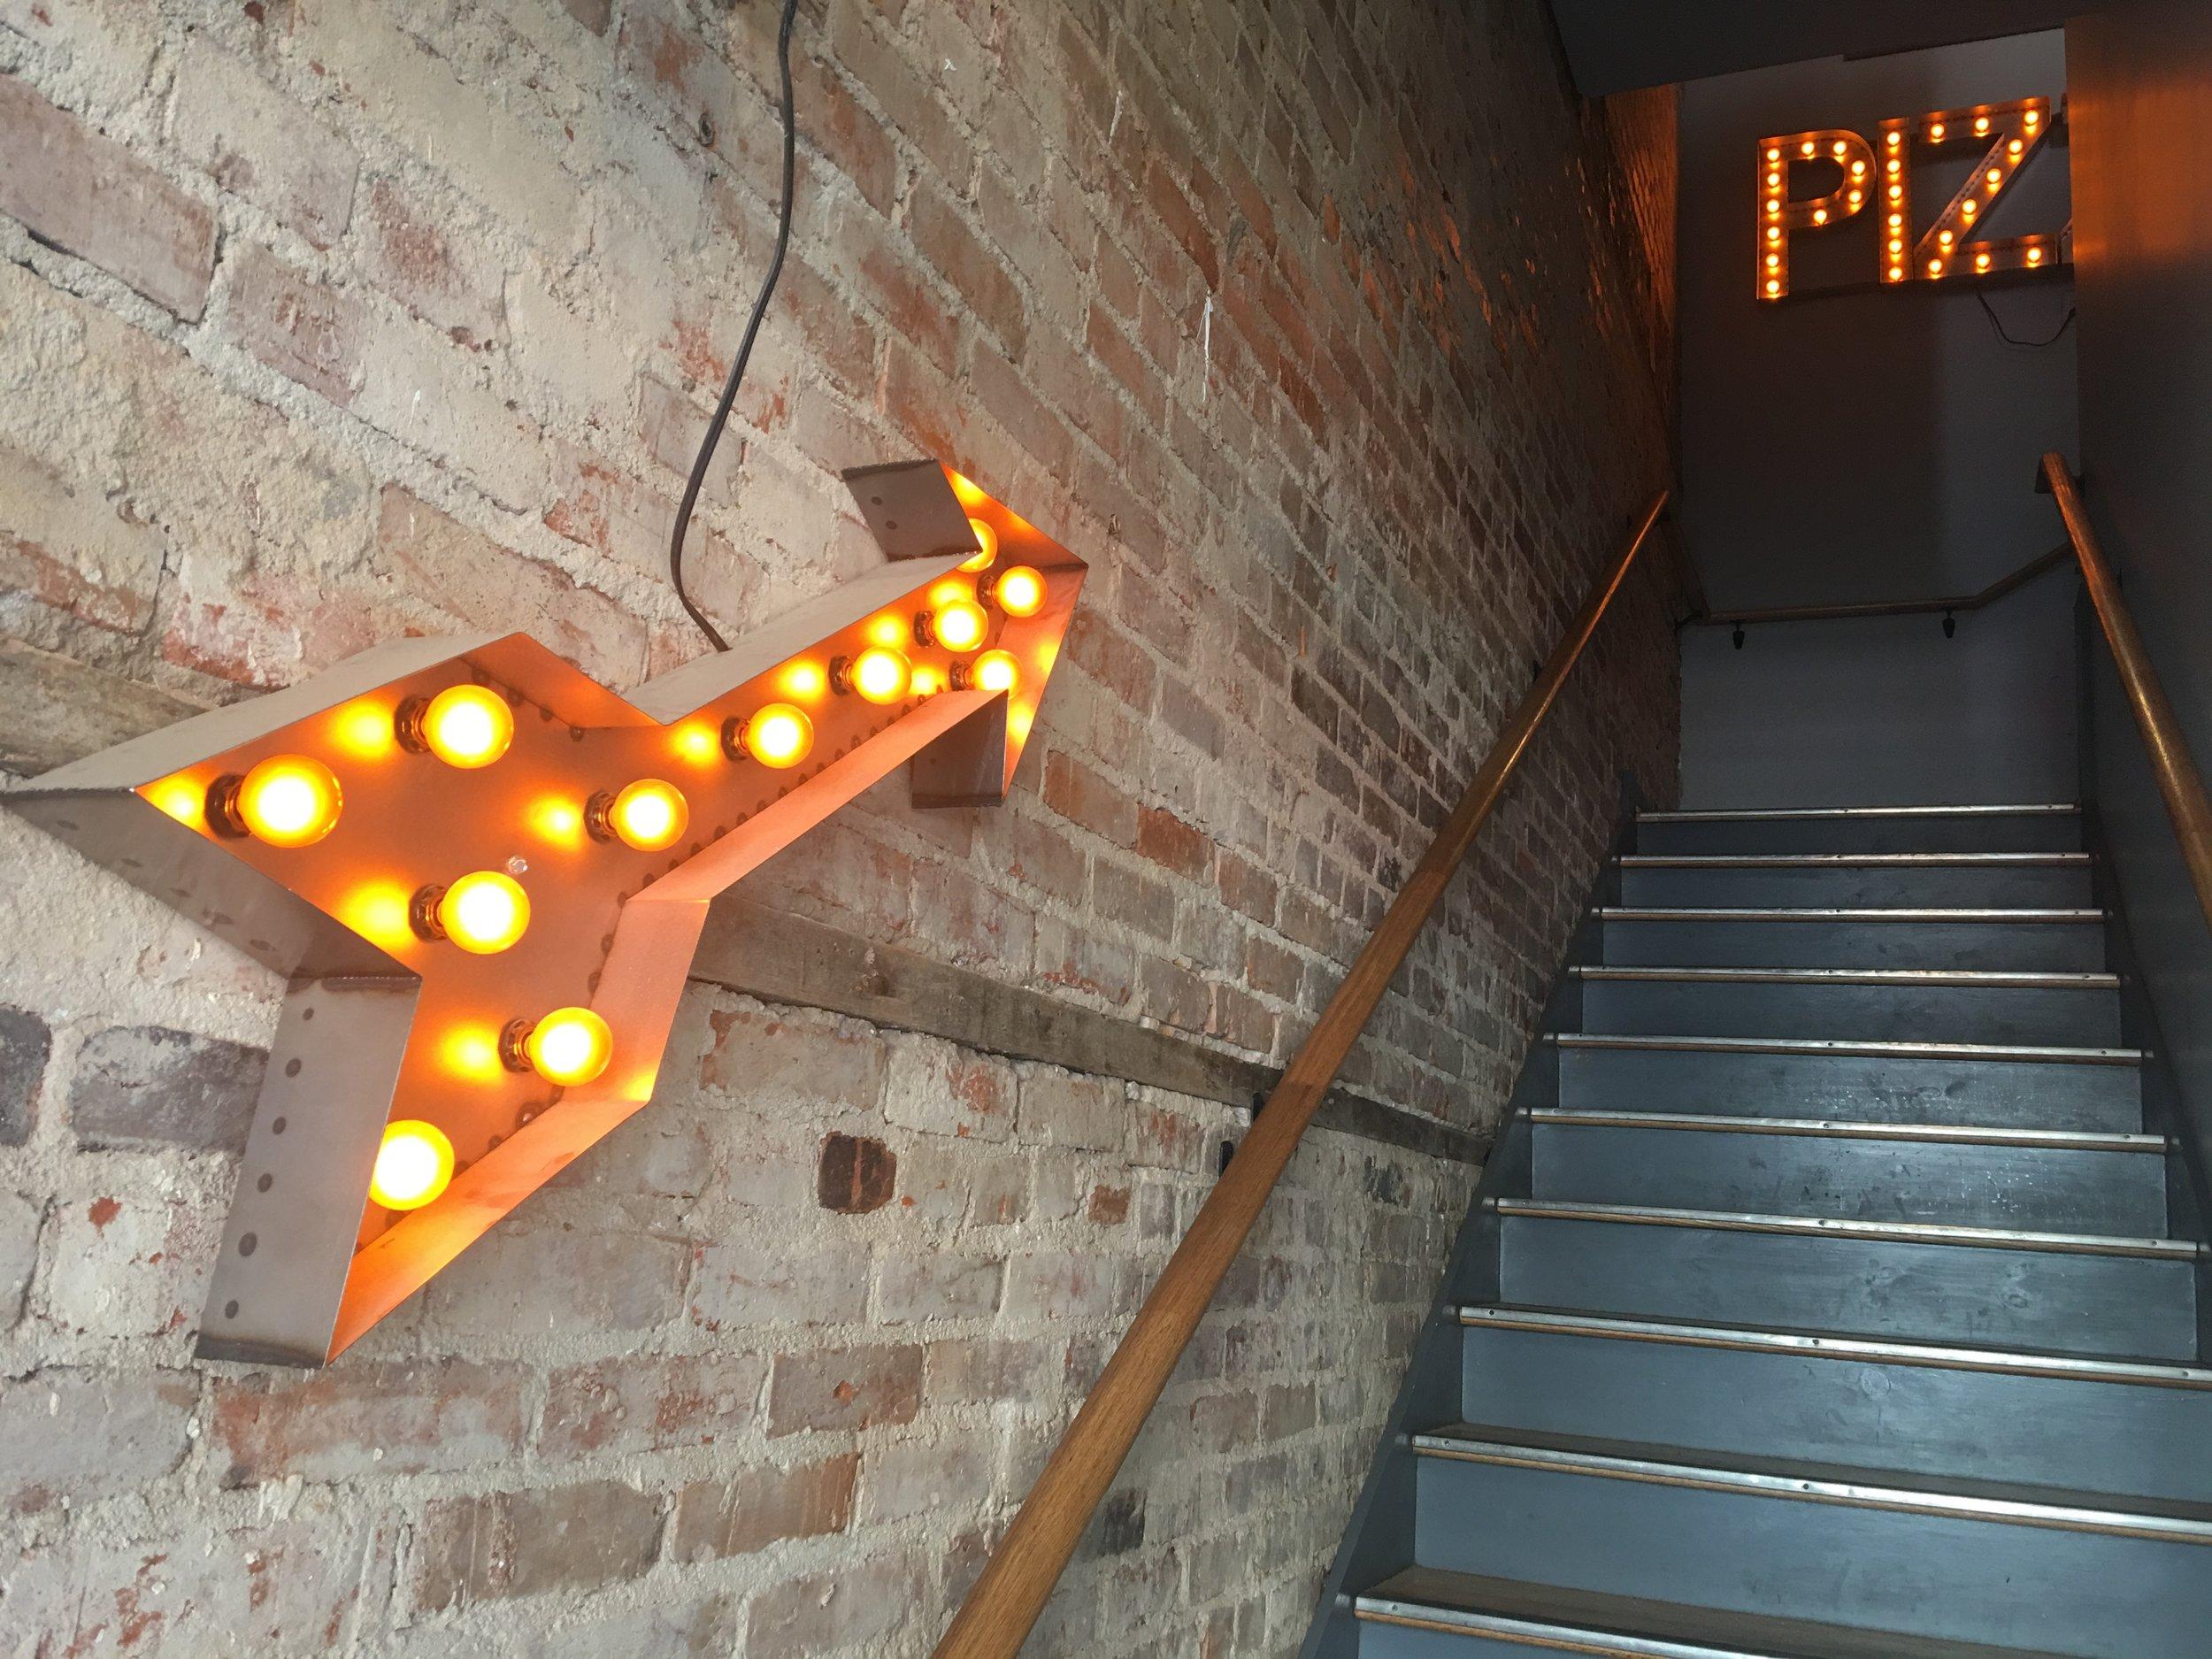 Pie Pushers stairs